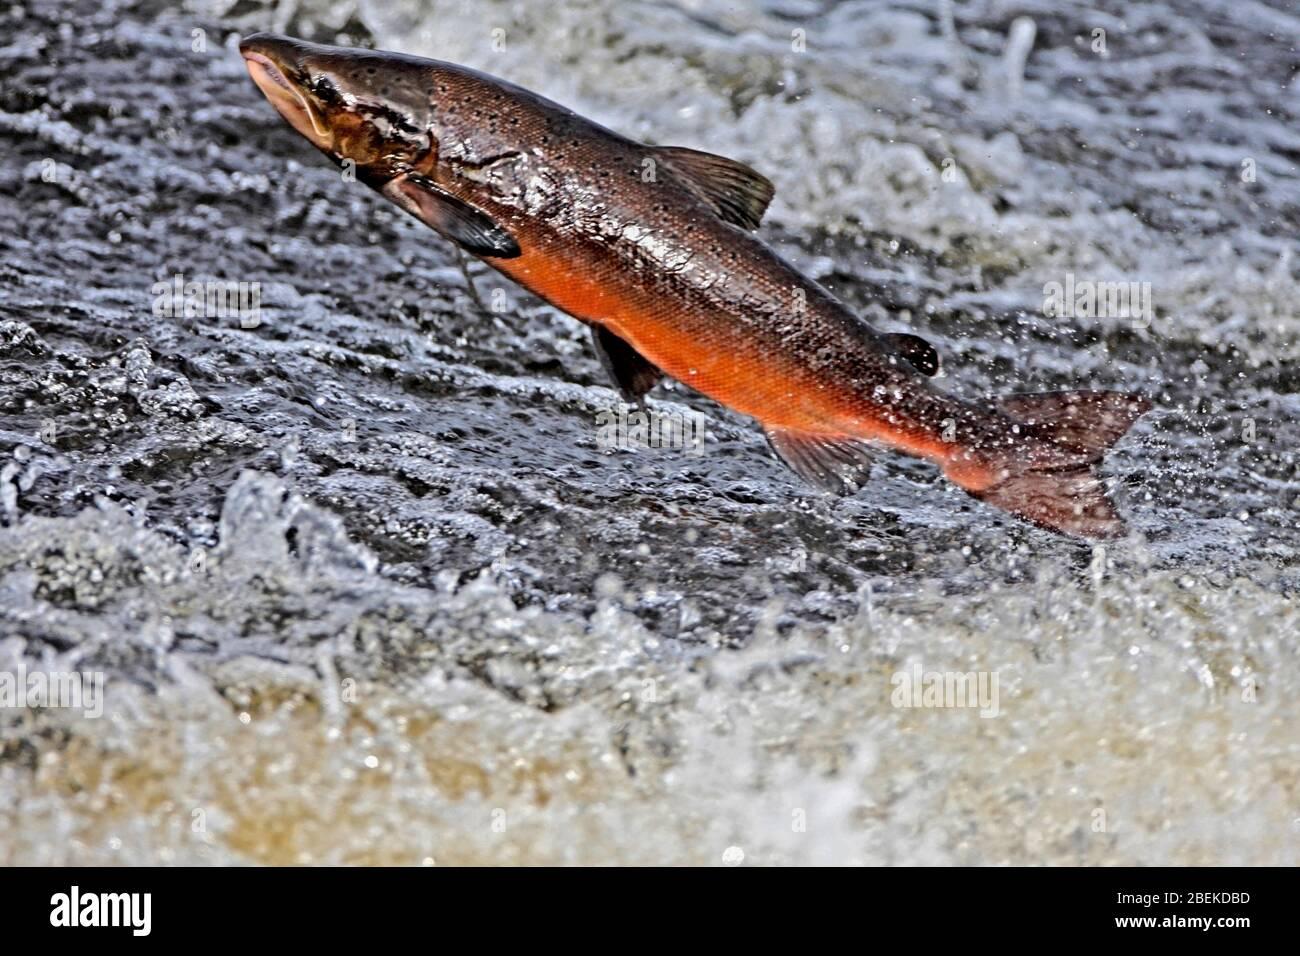 atlantic-salmon-leaping-scotland-uk-2BEKDBD.jpg